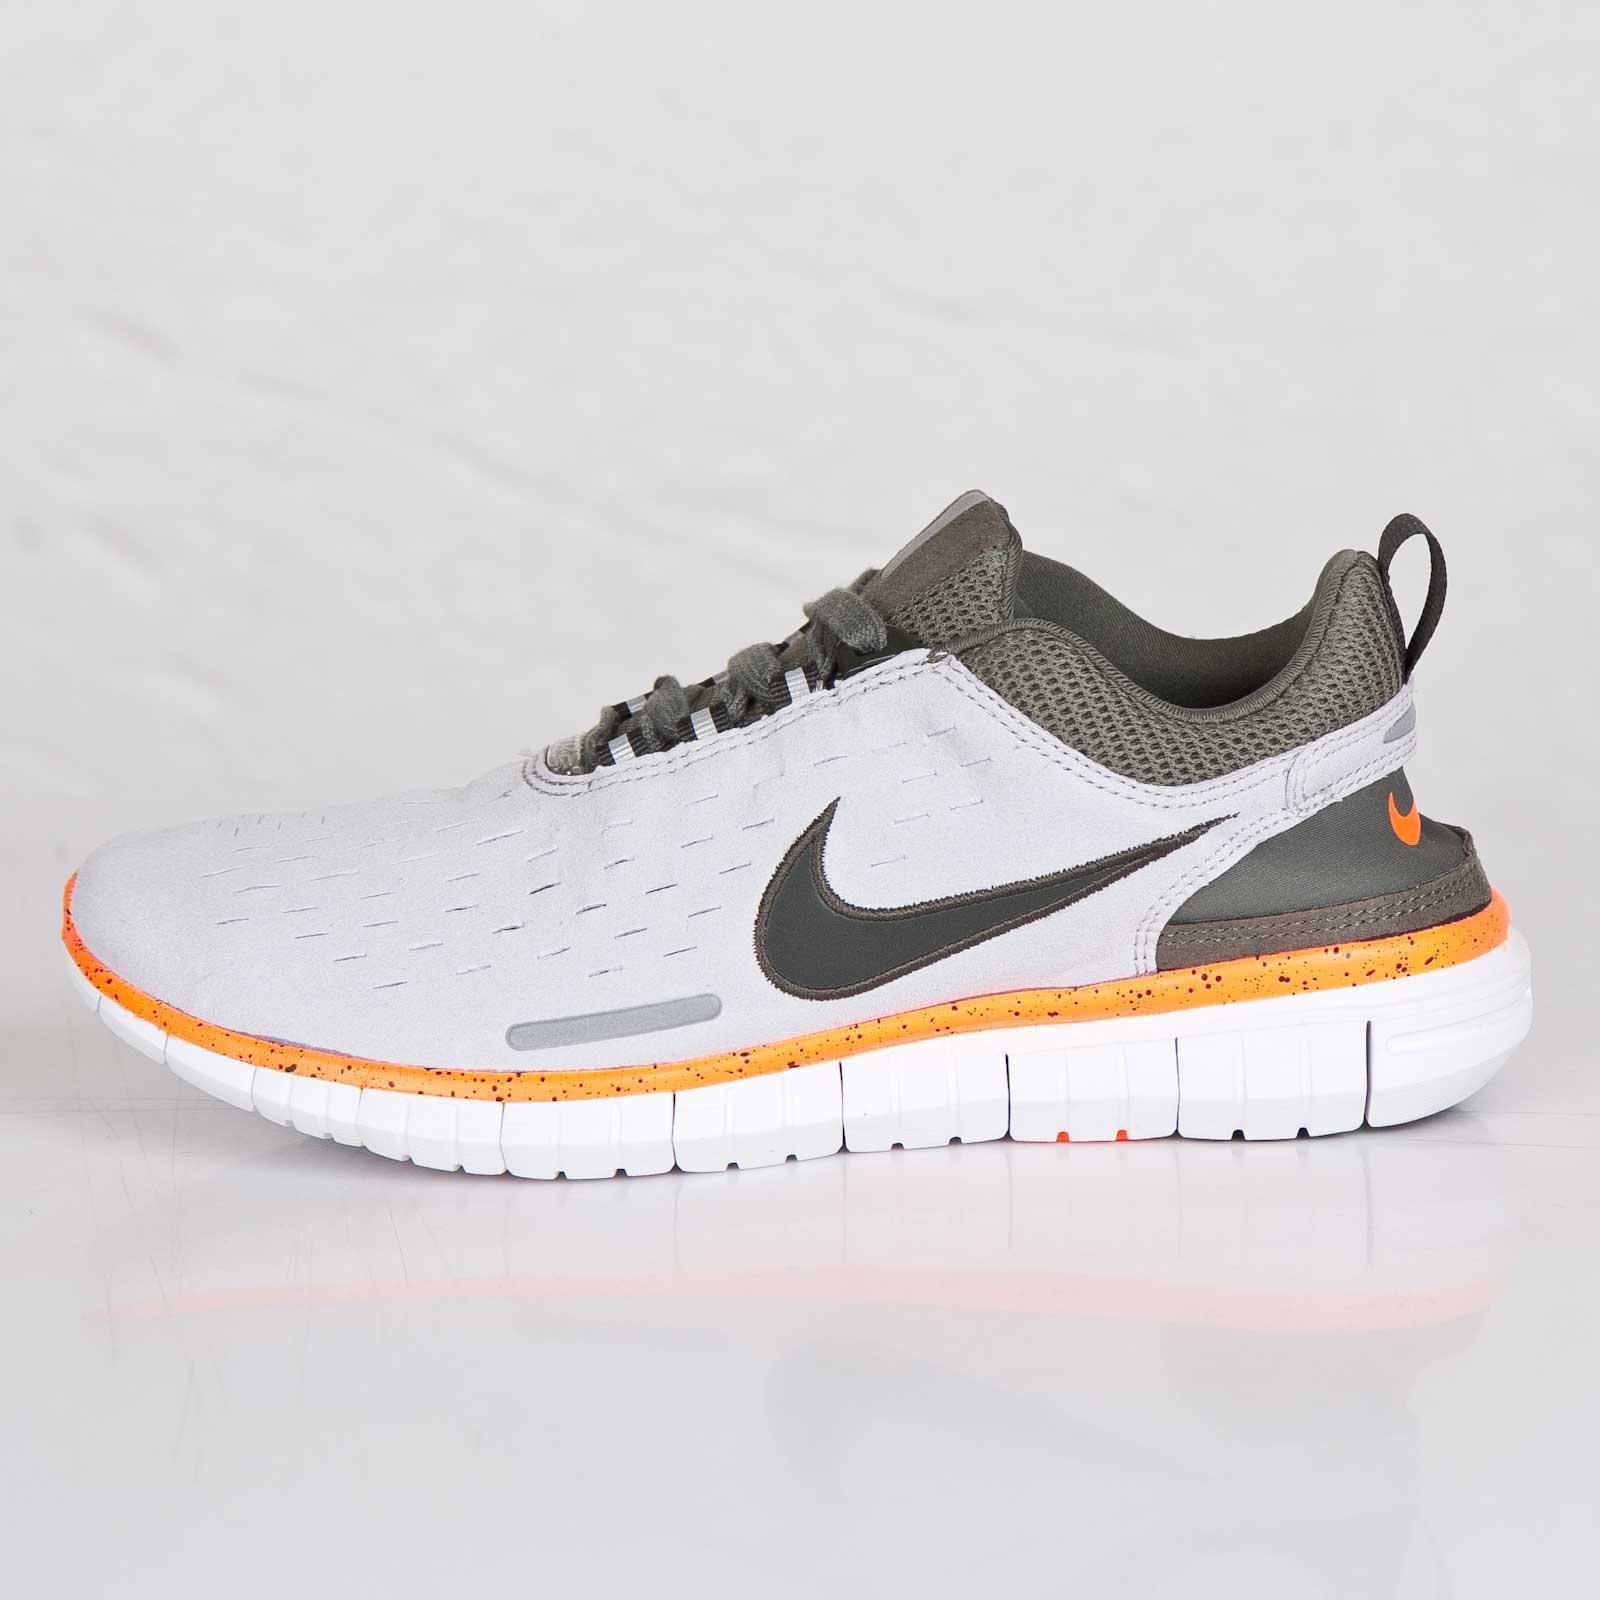 a97c0b3bf985 Nike Free OG 14 - 642402-002 - Sneakersnstuff